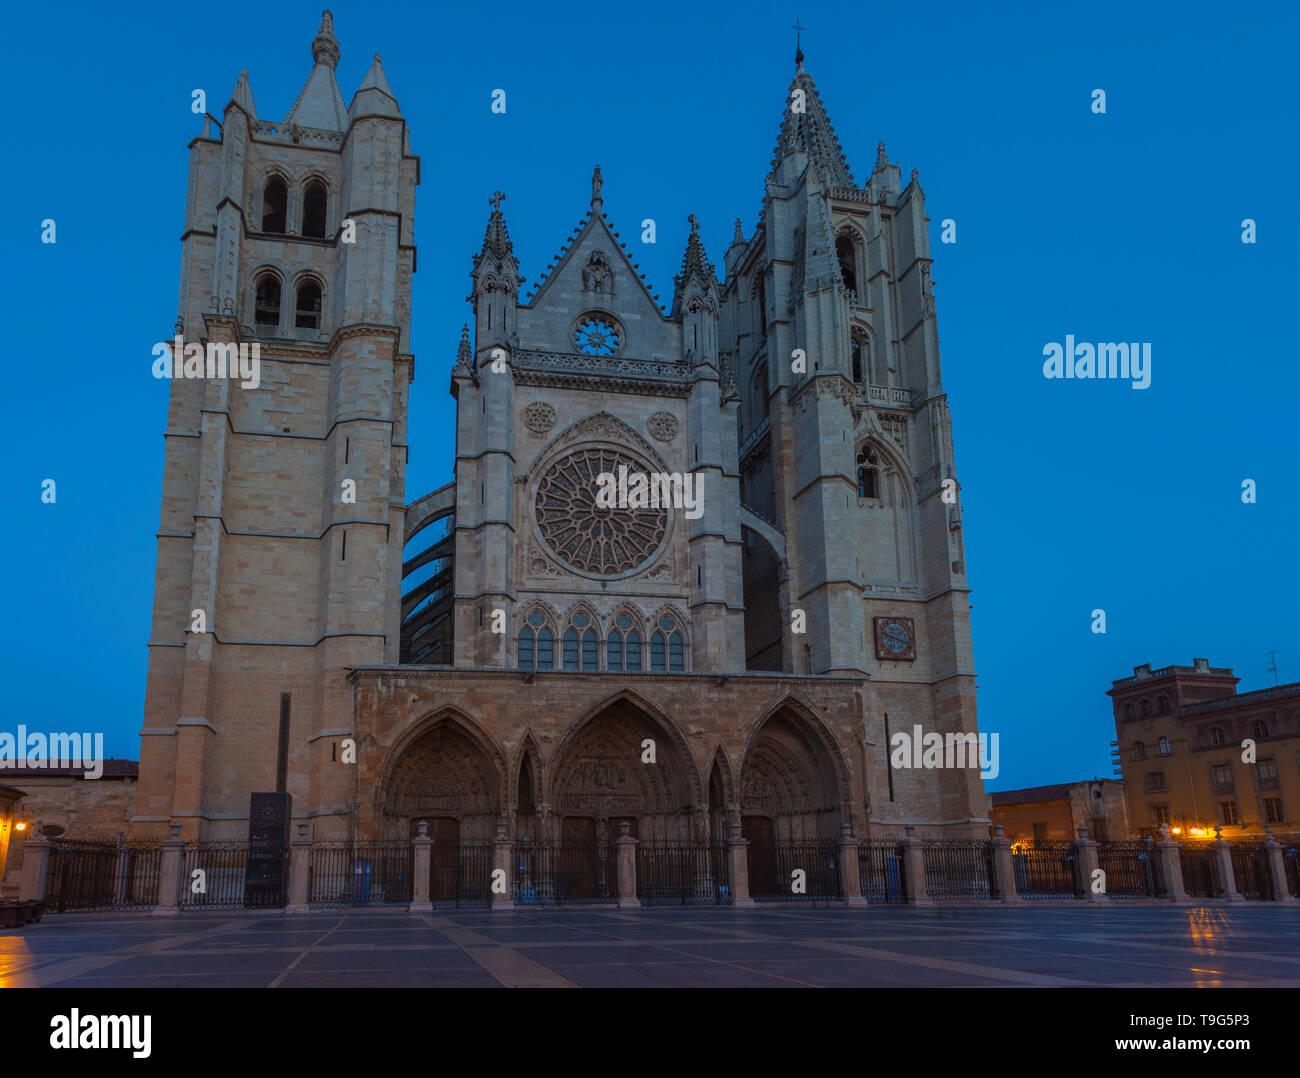 Gothic cathedral of Leon. Castilla y Leon, Spain. - Stock Image